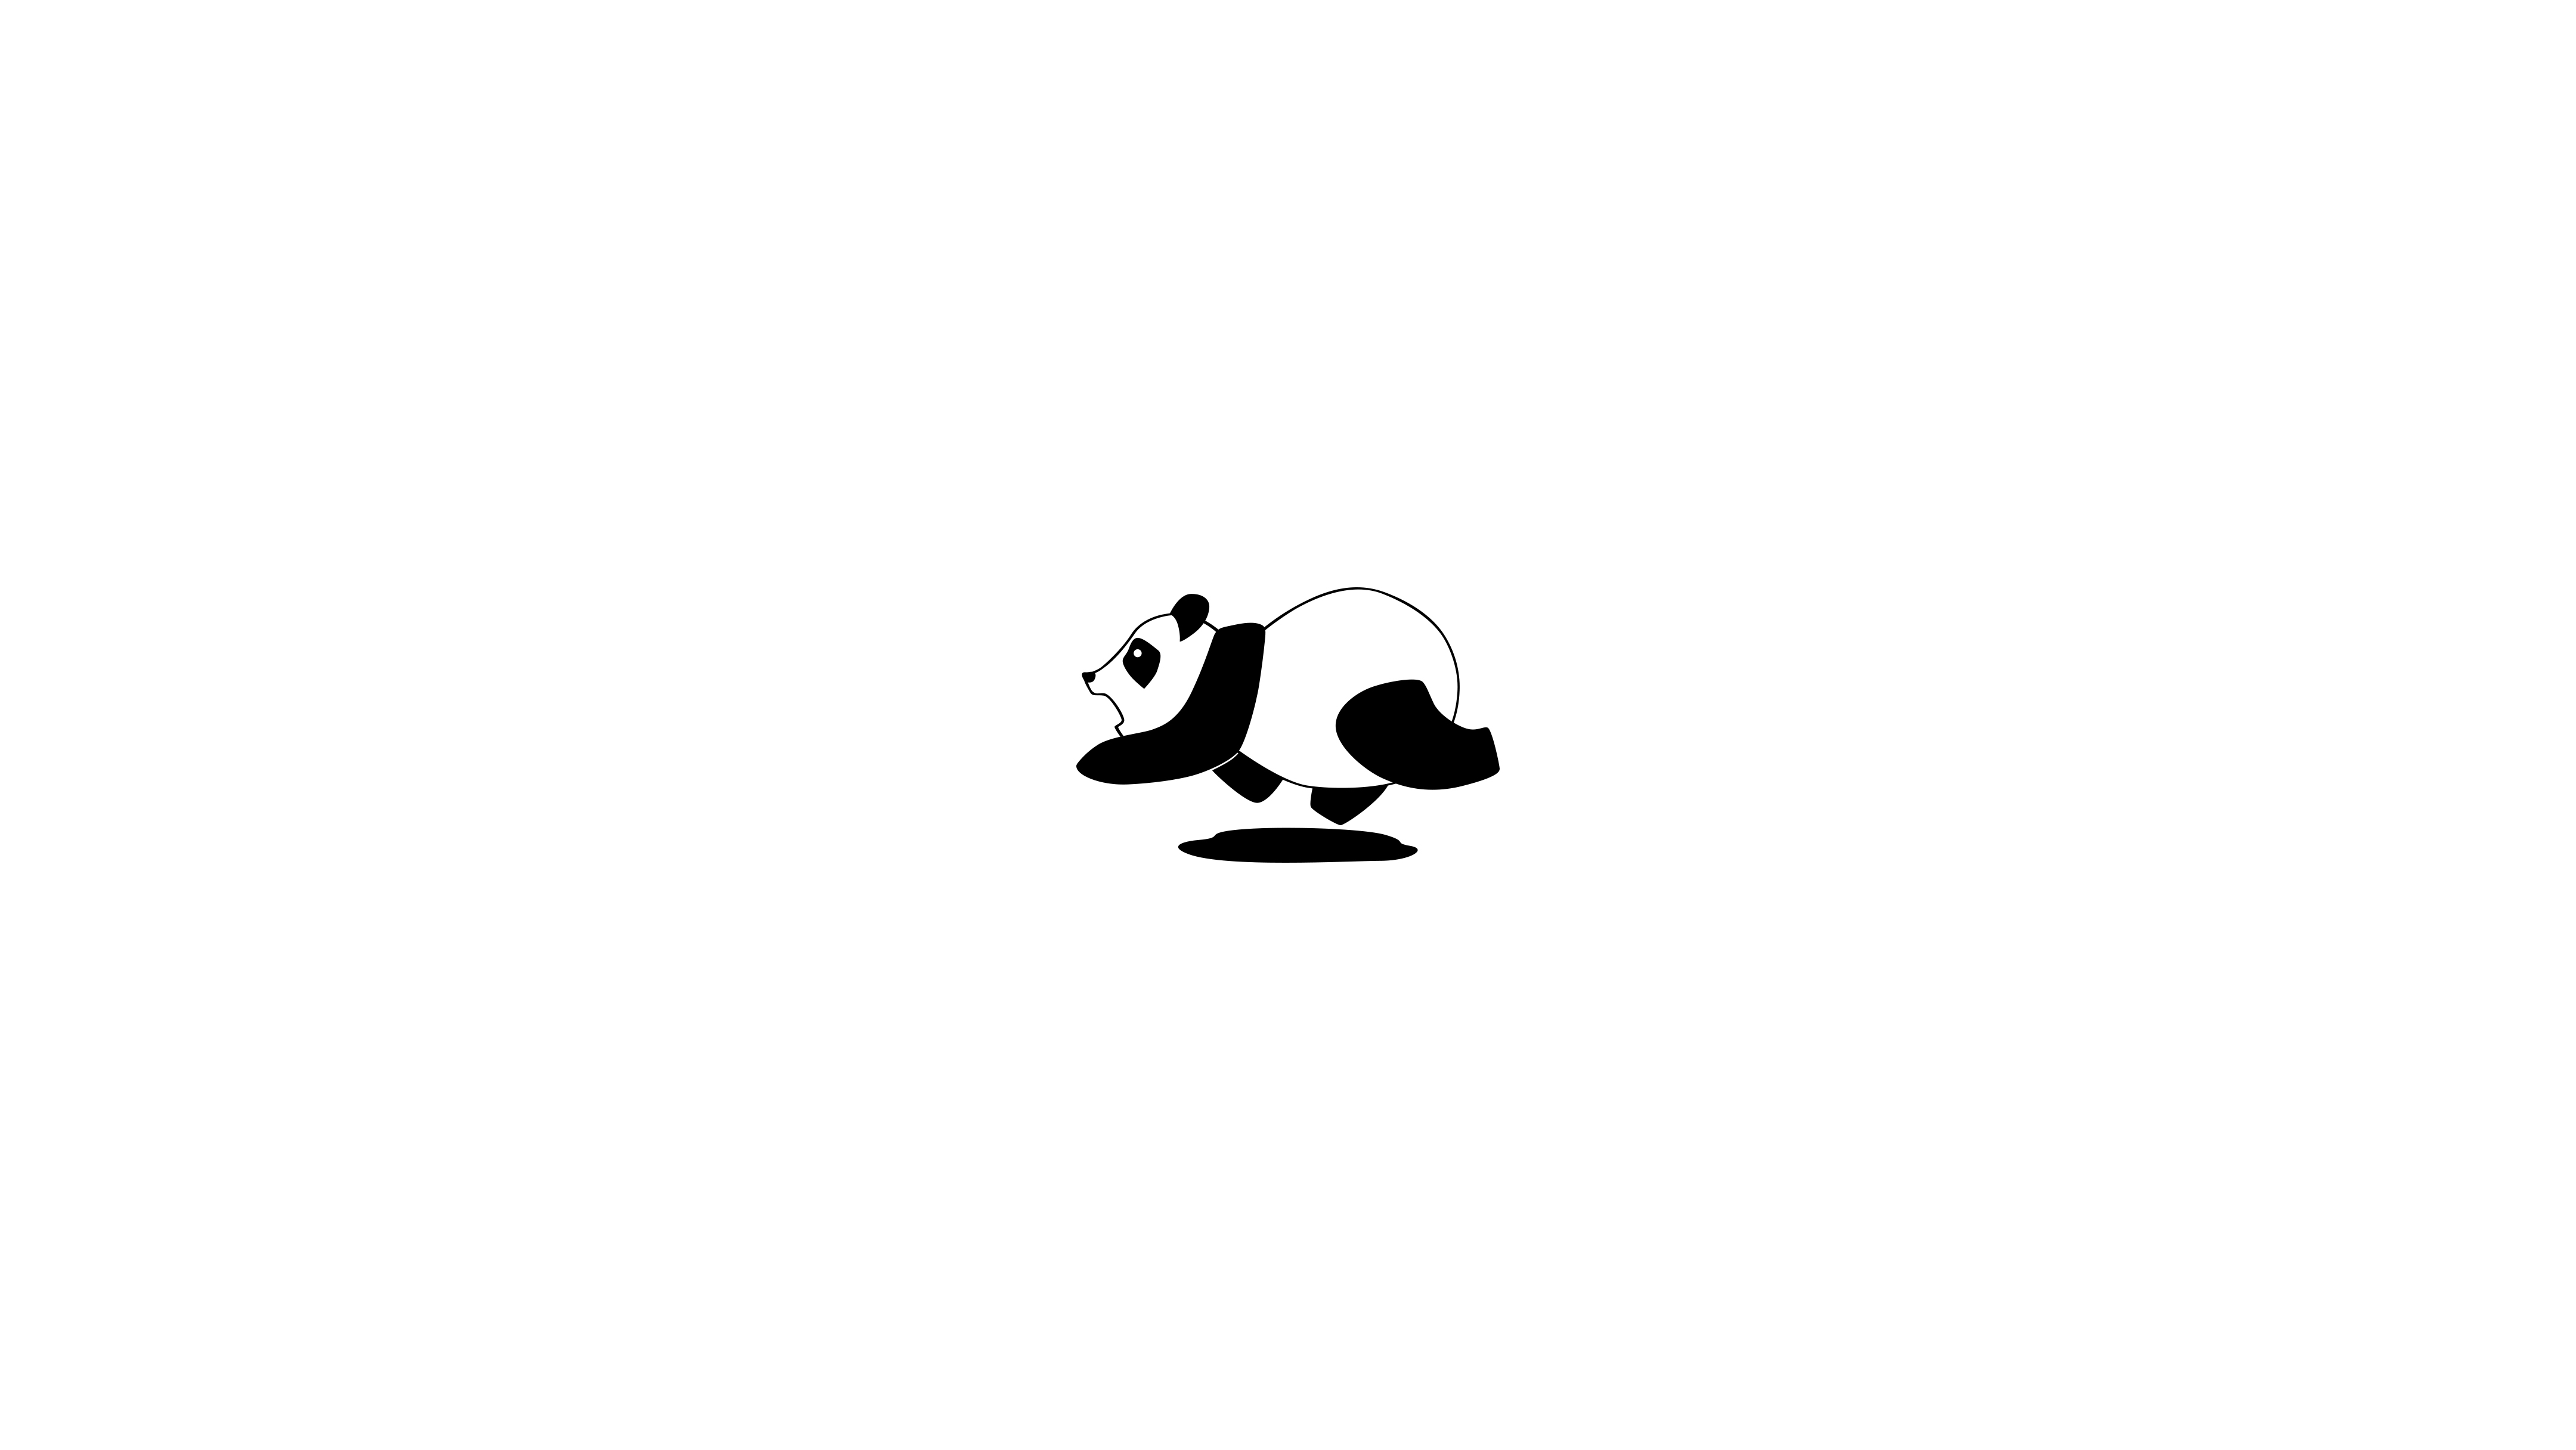 черно белые картинки панды